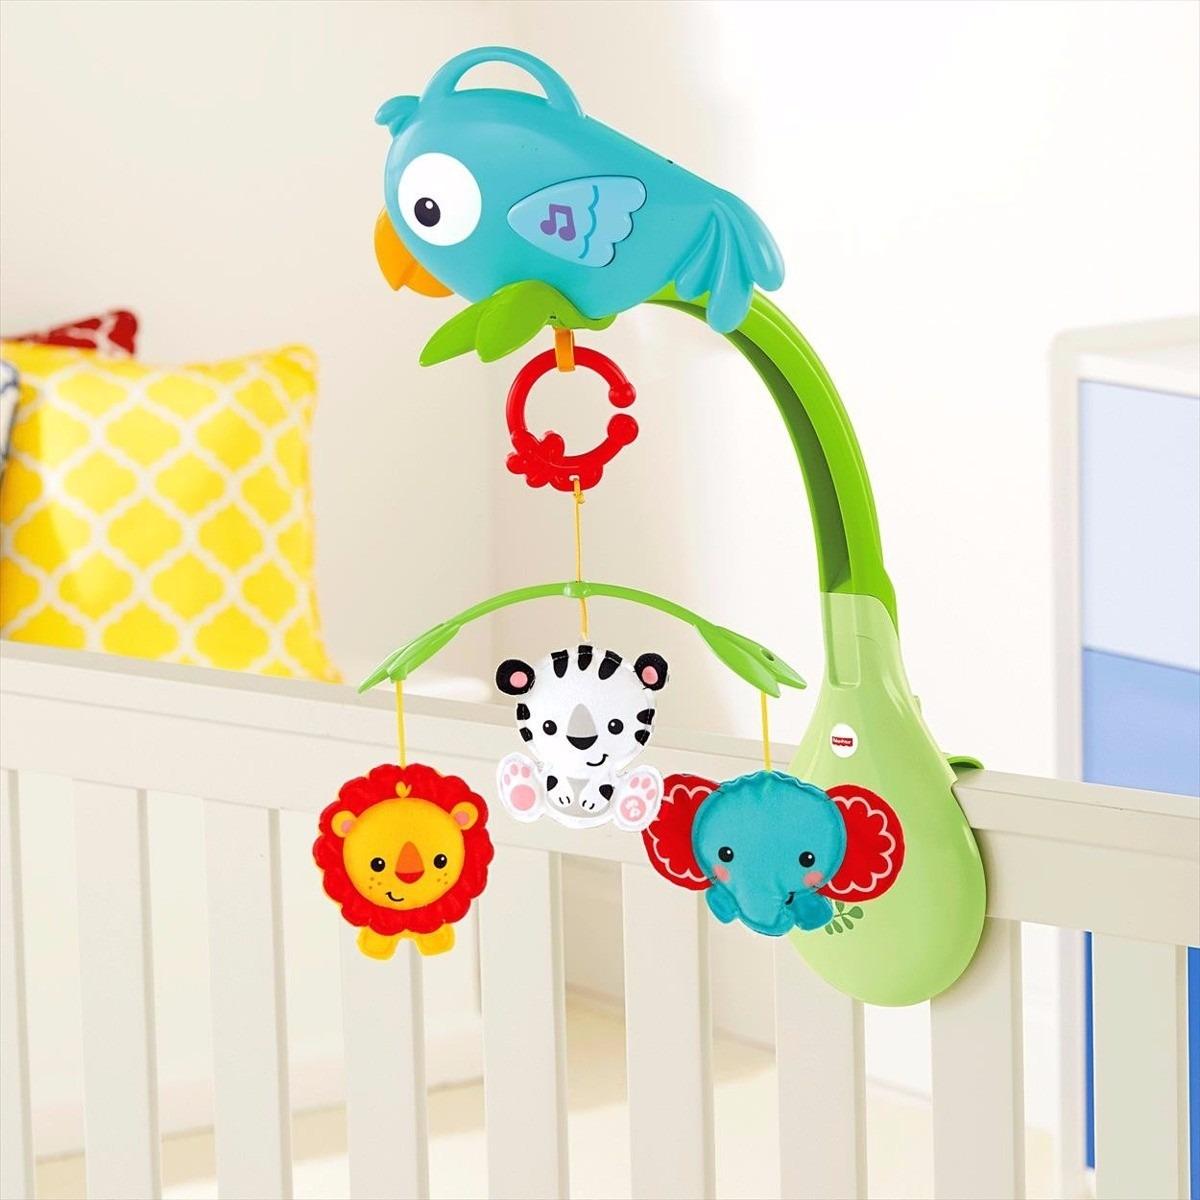 Movil fisher price musica movil movil para cuna de bebe en mercado libre - Movil para cuna bebe ...